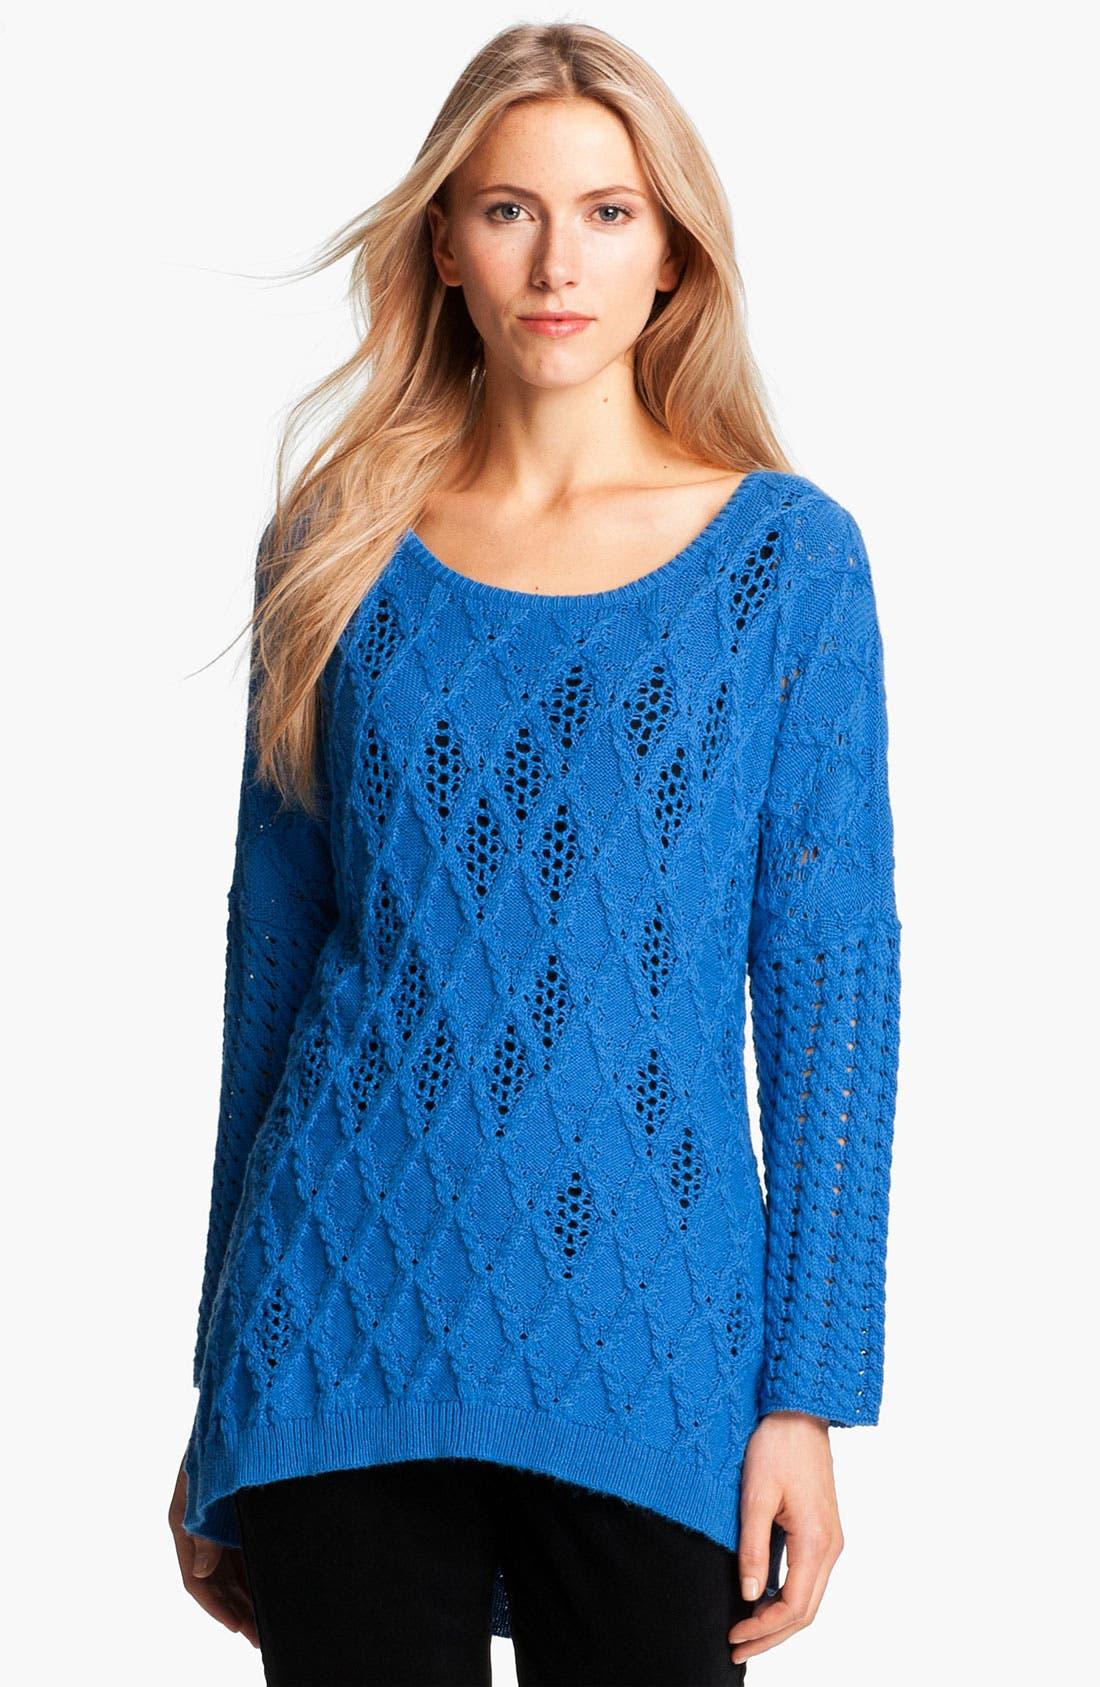 Main Image - Nic + Zoe Bateau Neck Mix Knit Sweater